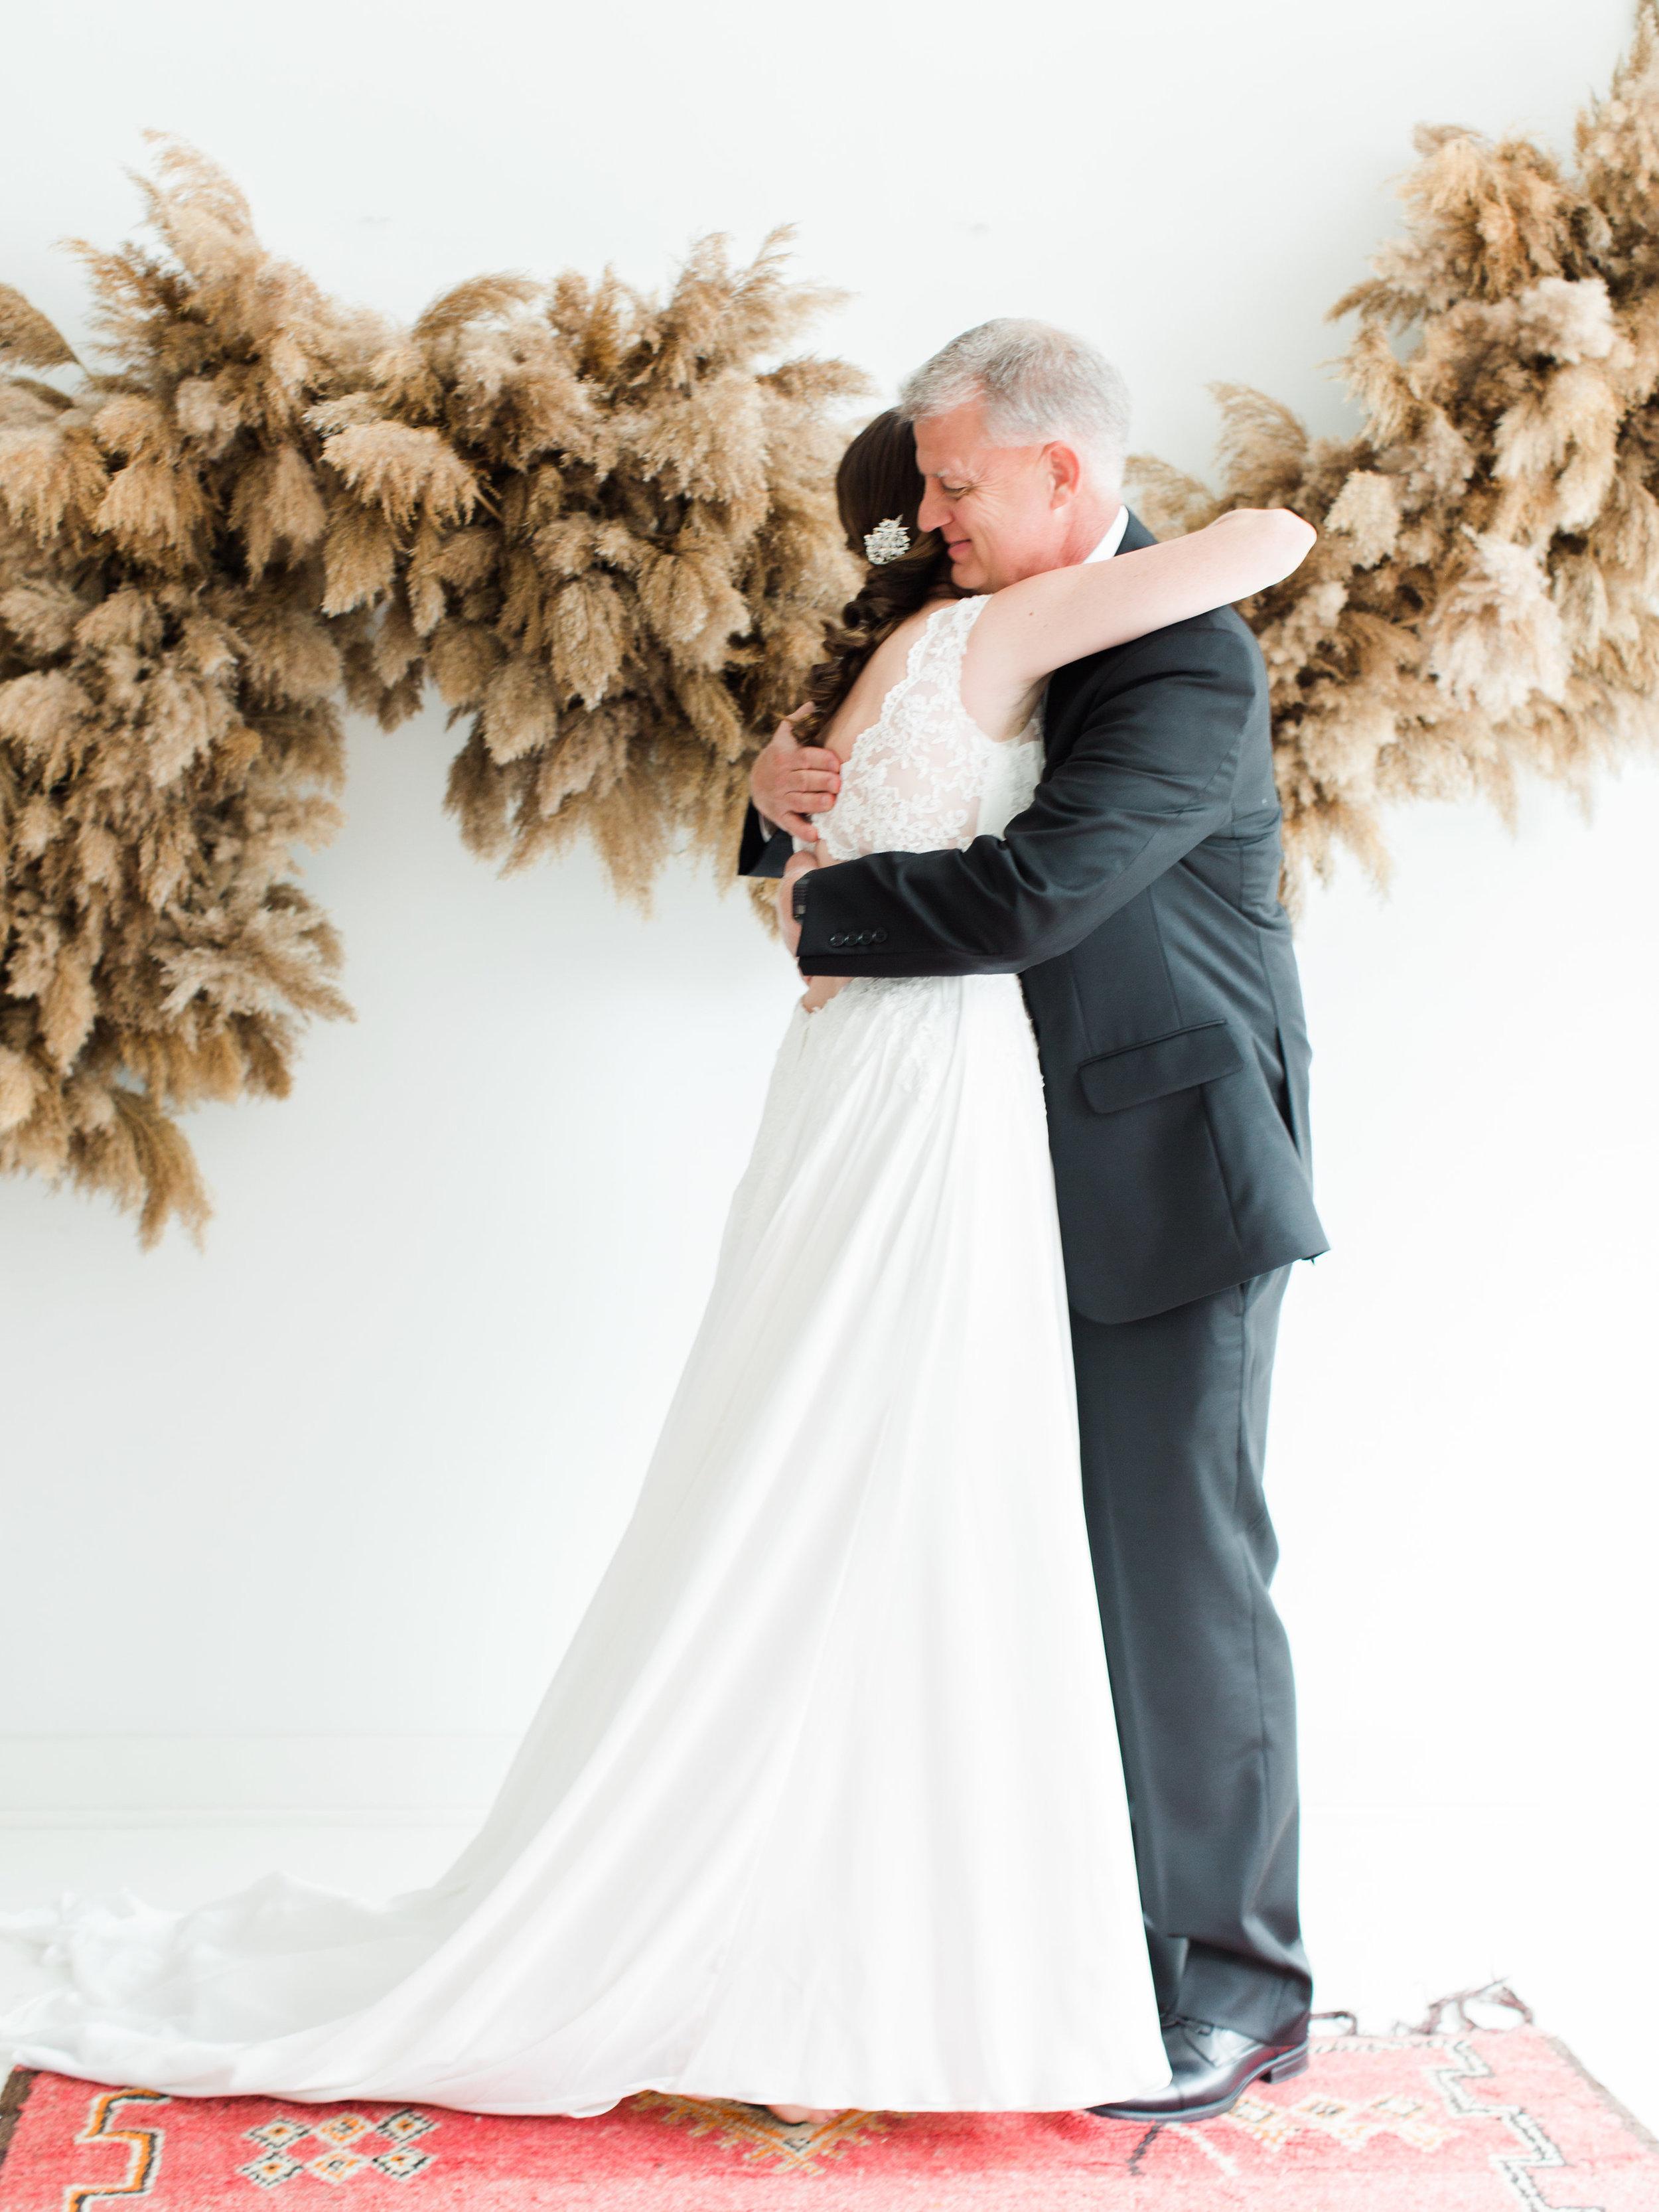 Julius+Wedding+FirstLook+Dad-5.jpg